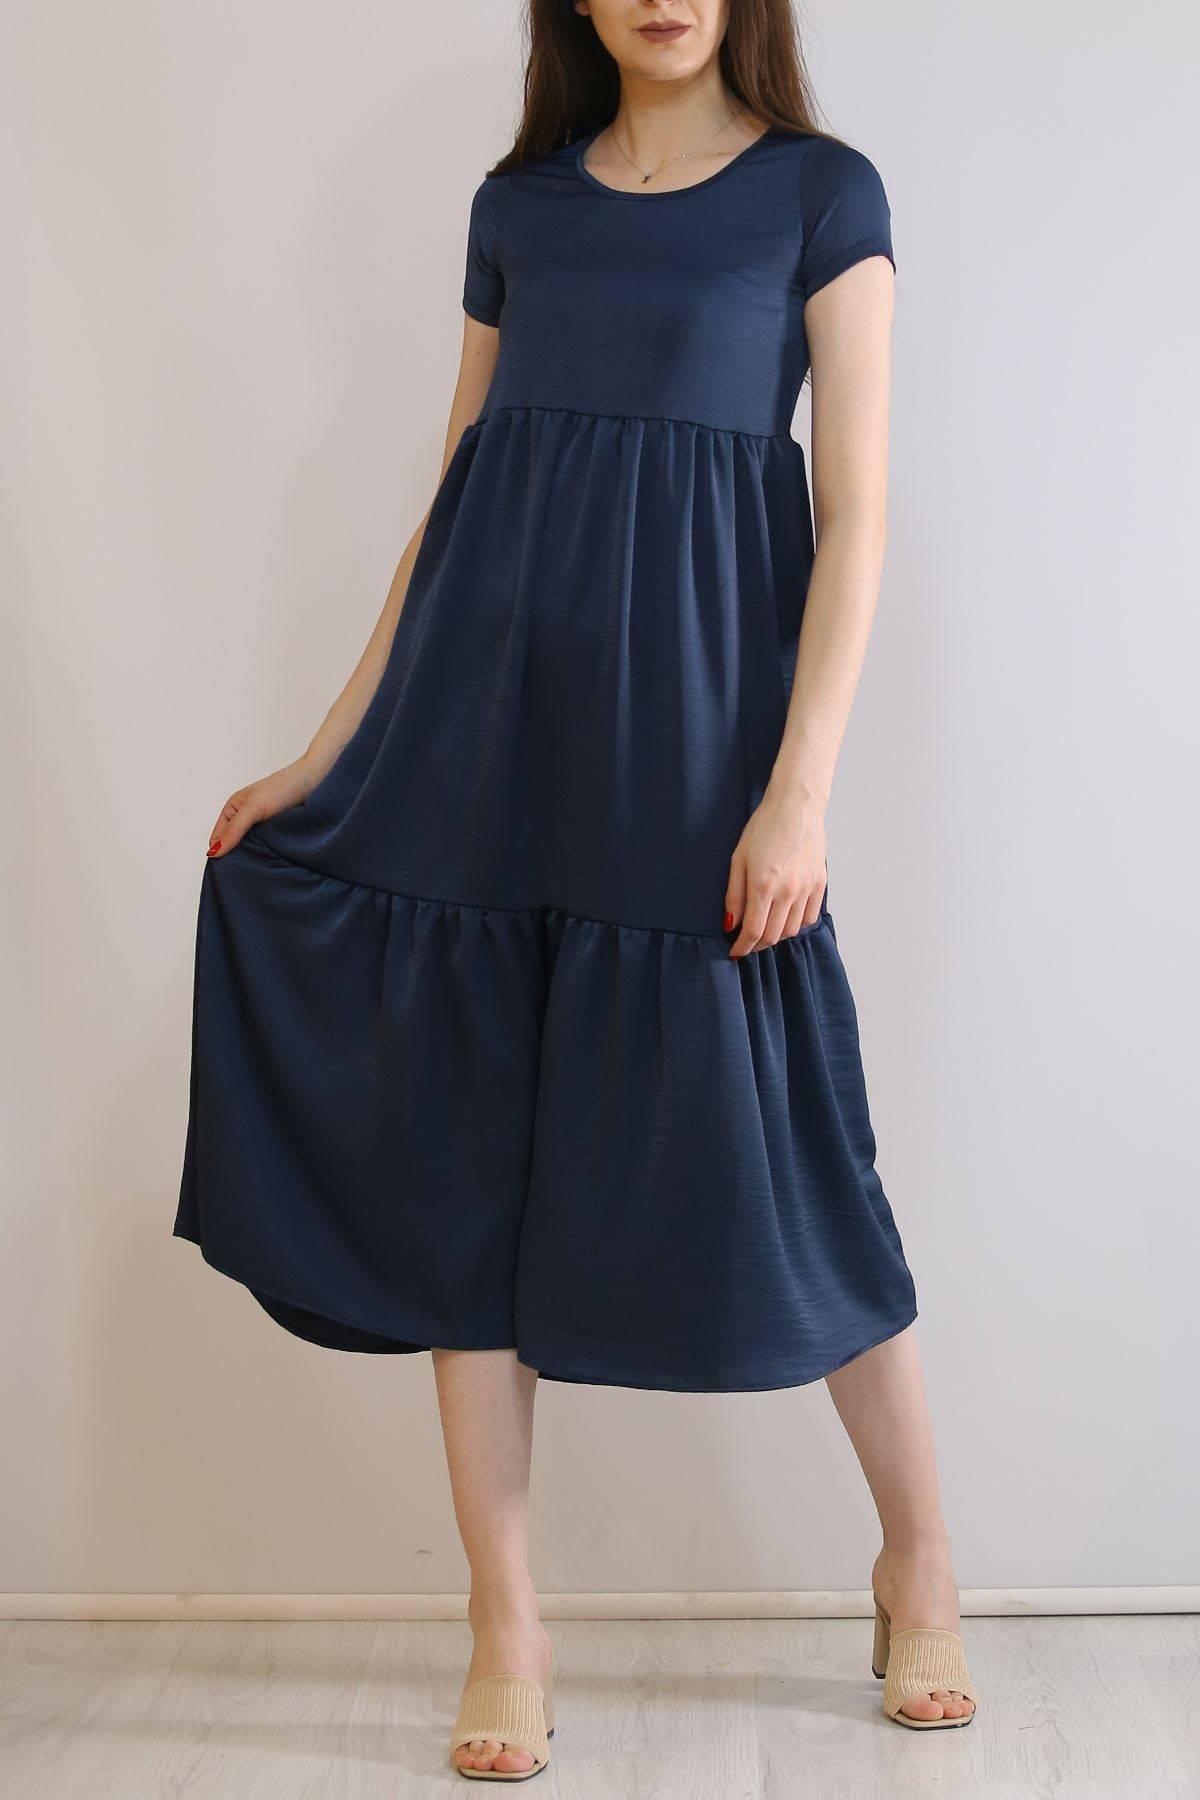 Ayrobin Elbise Lacivert - 6023.1247.